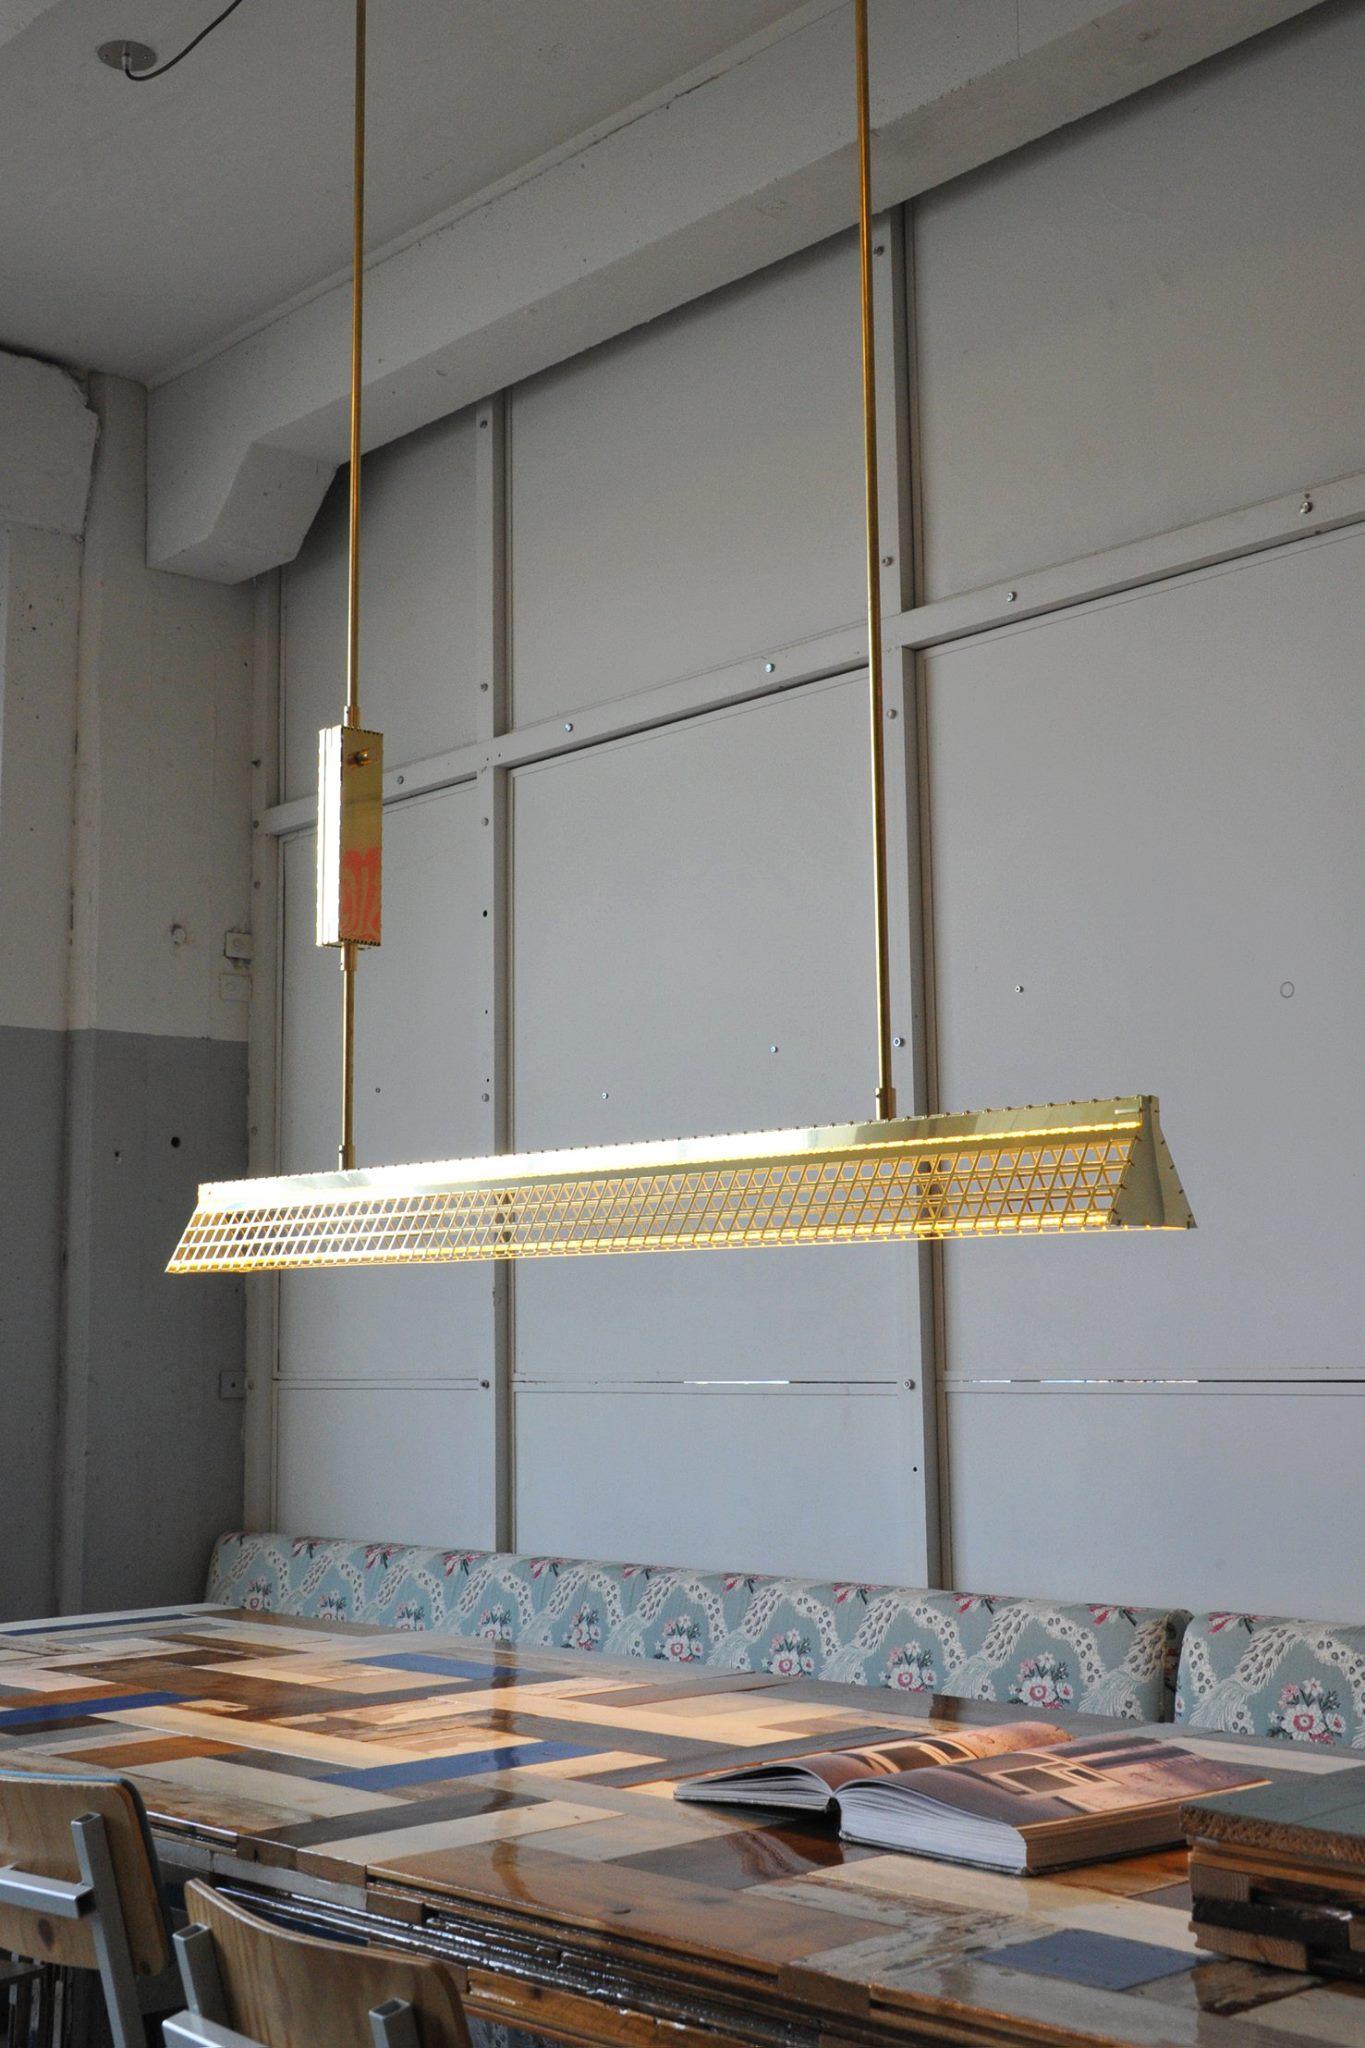 architektur design holland m bel niederlande piet hein eek inspiration uwe van. Black Bedroom Furniture Sets. Home Design Ideas